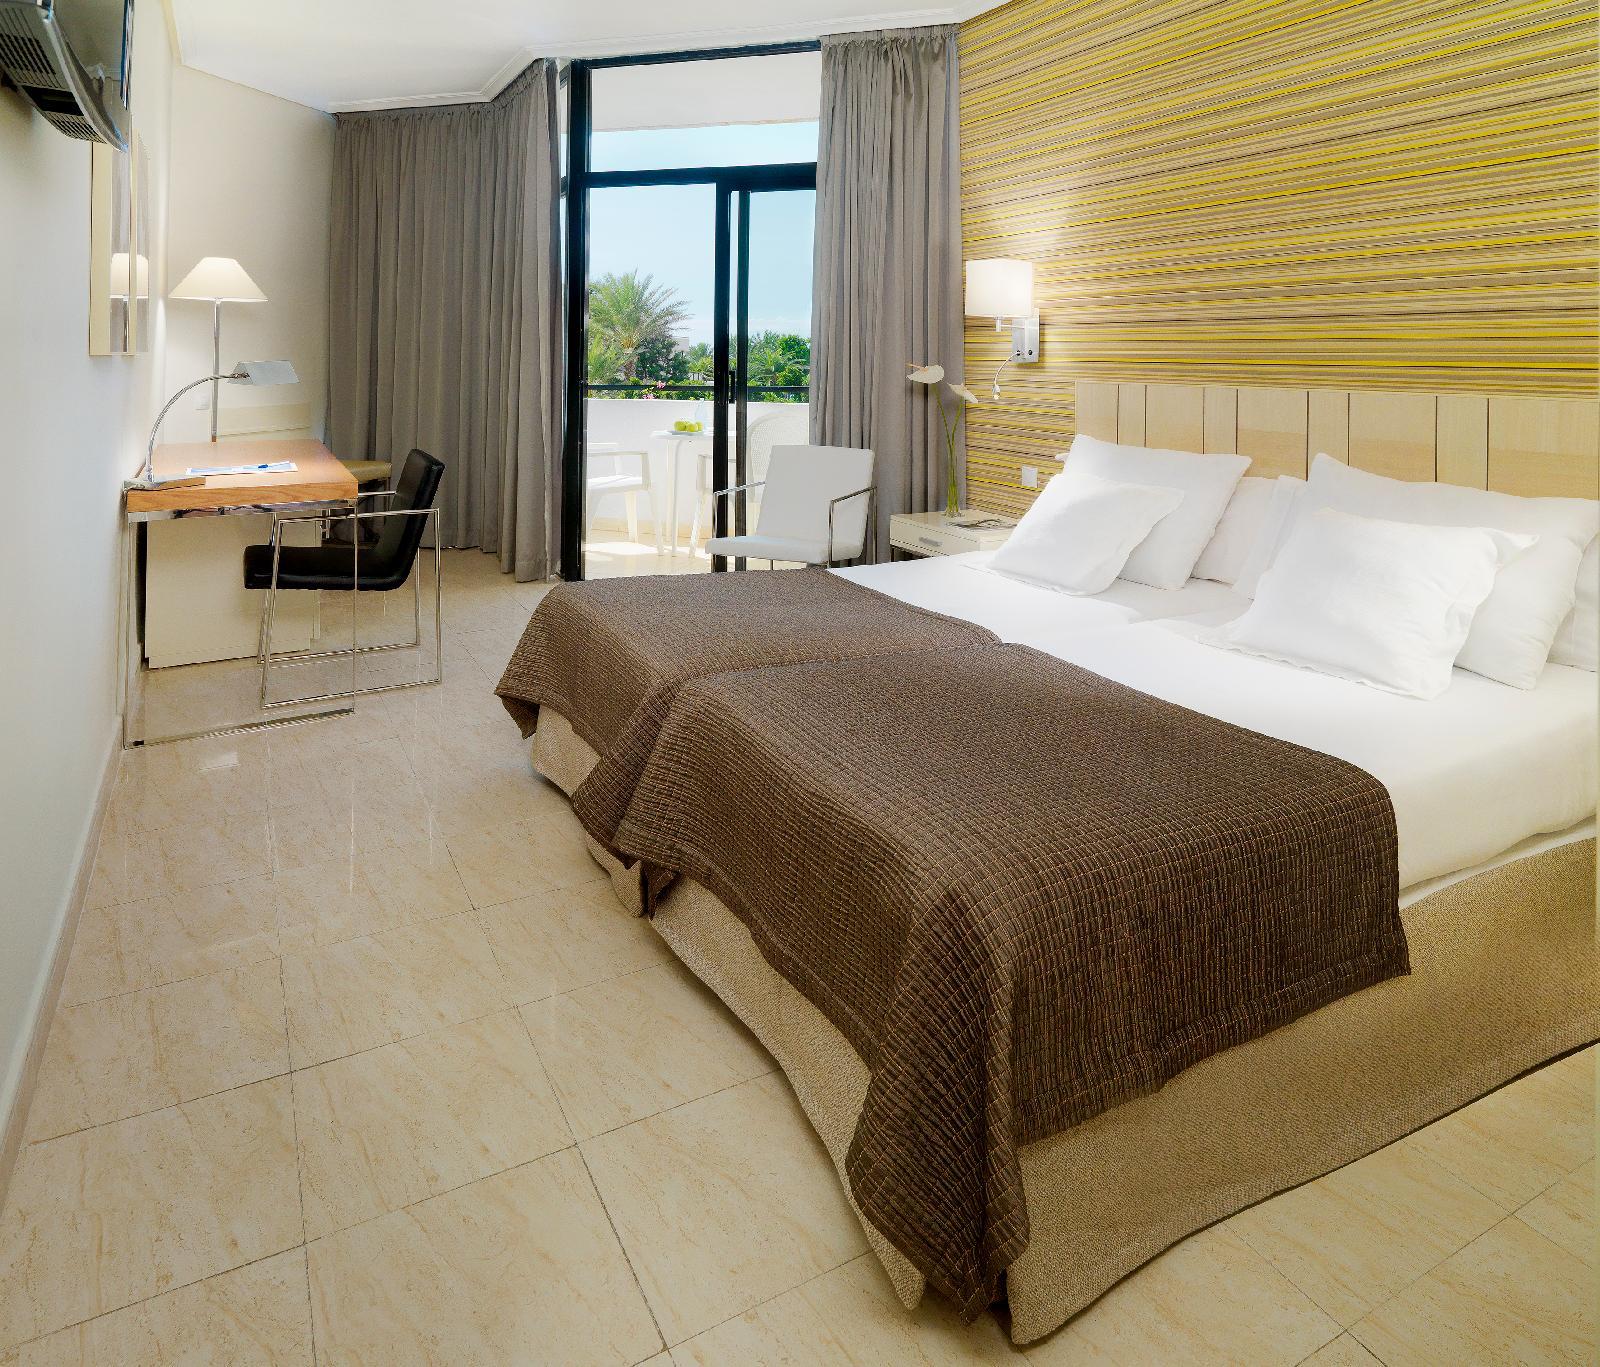 offerte di viaggi a playa las americas da 283. Black Bedroom Furniture Sets. Home Design Ideas